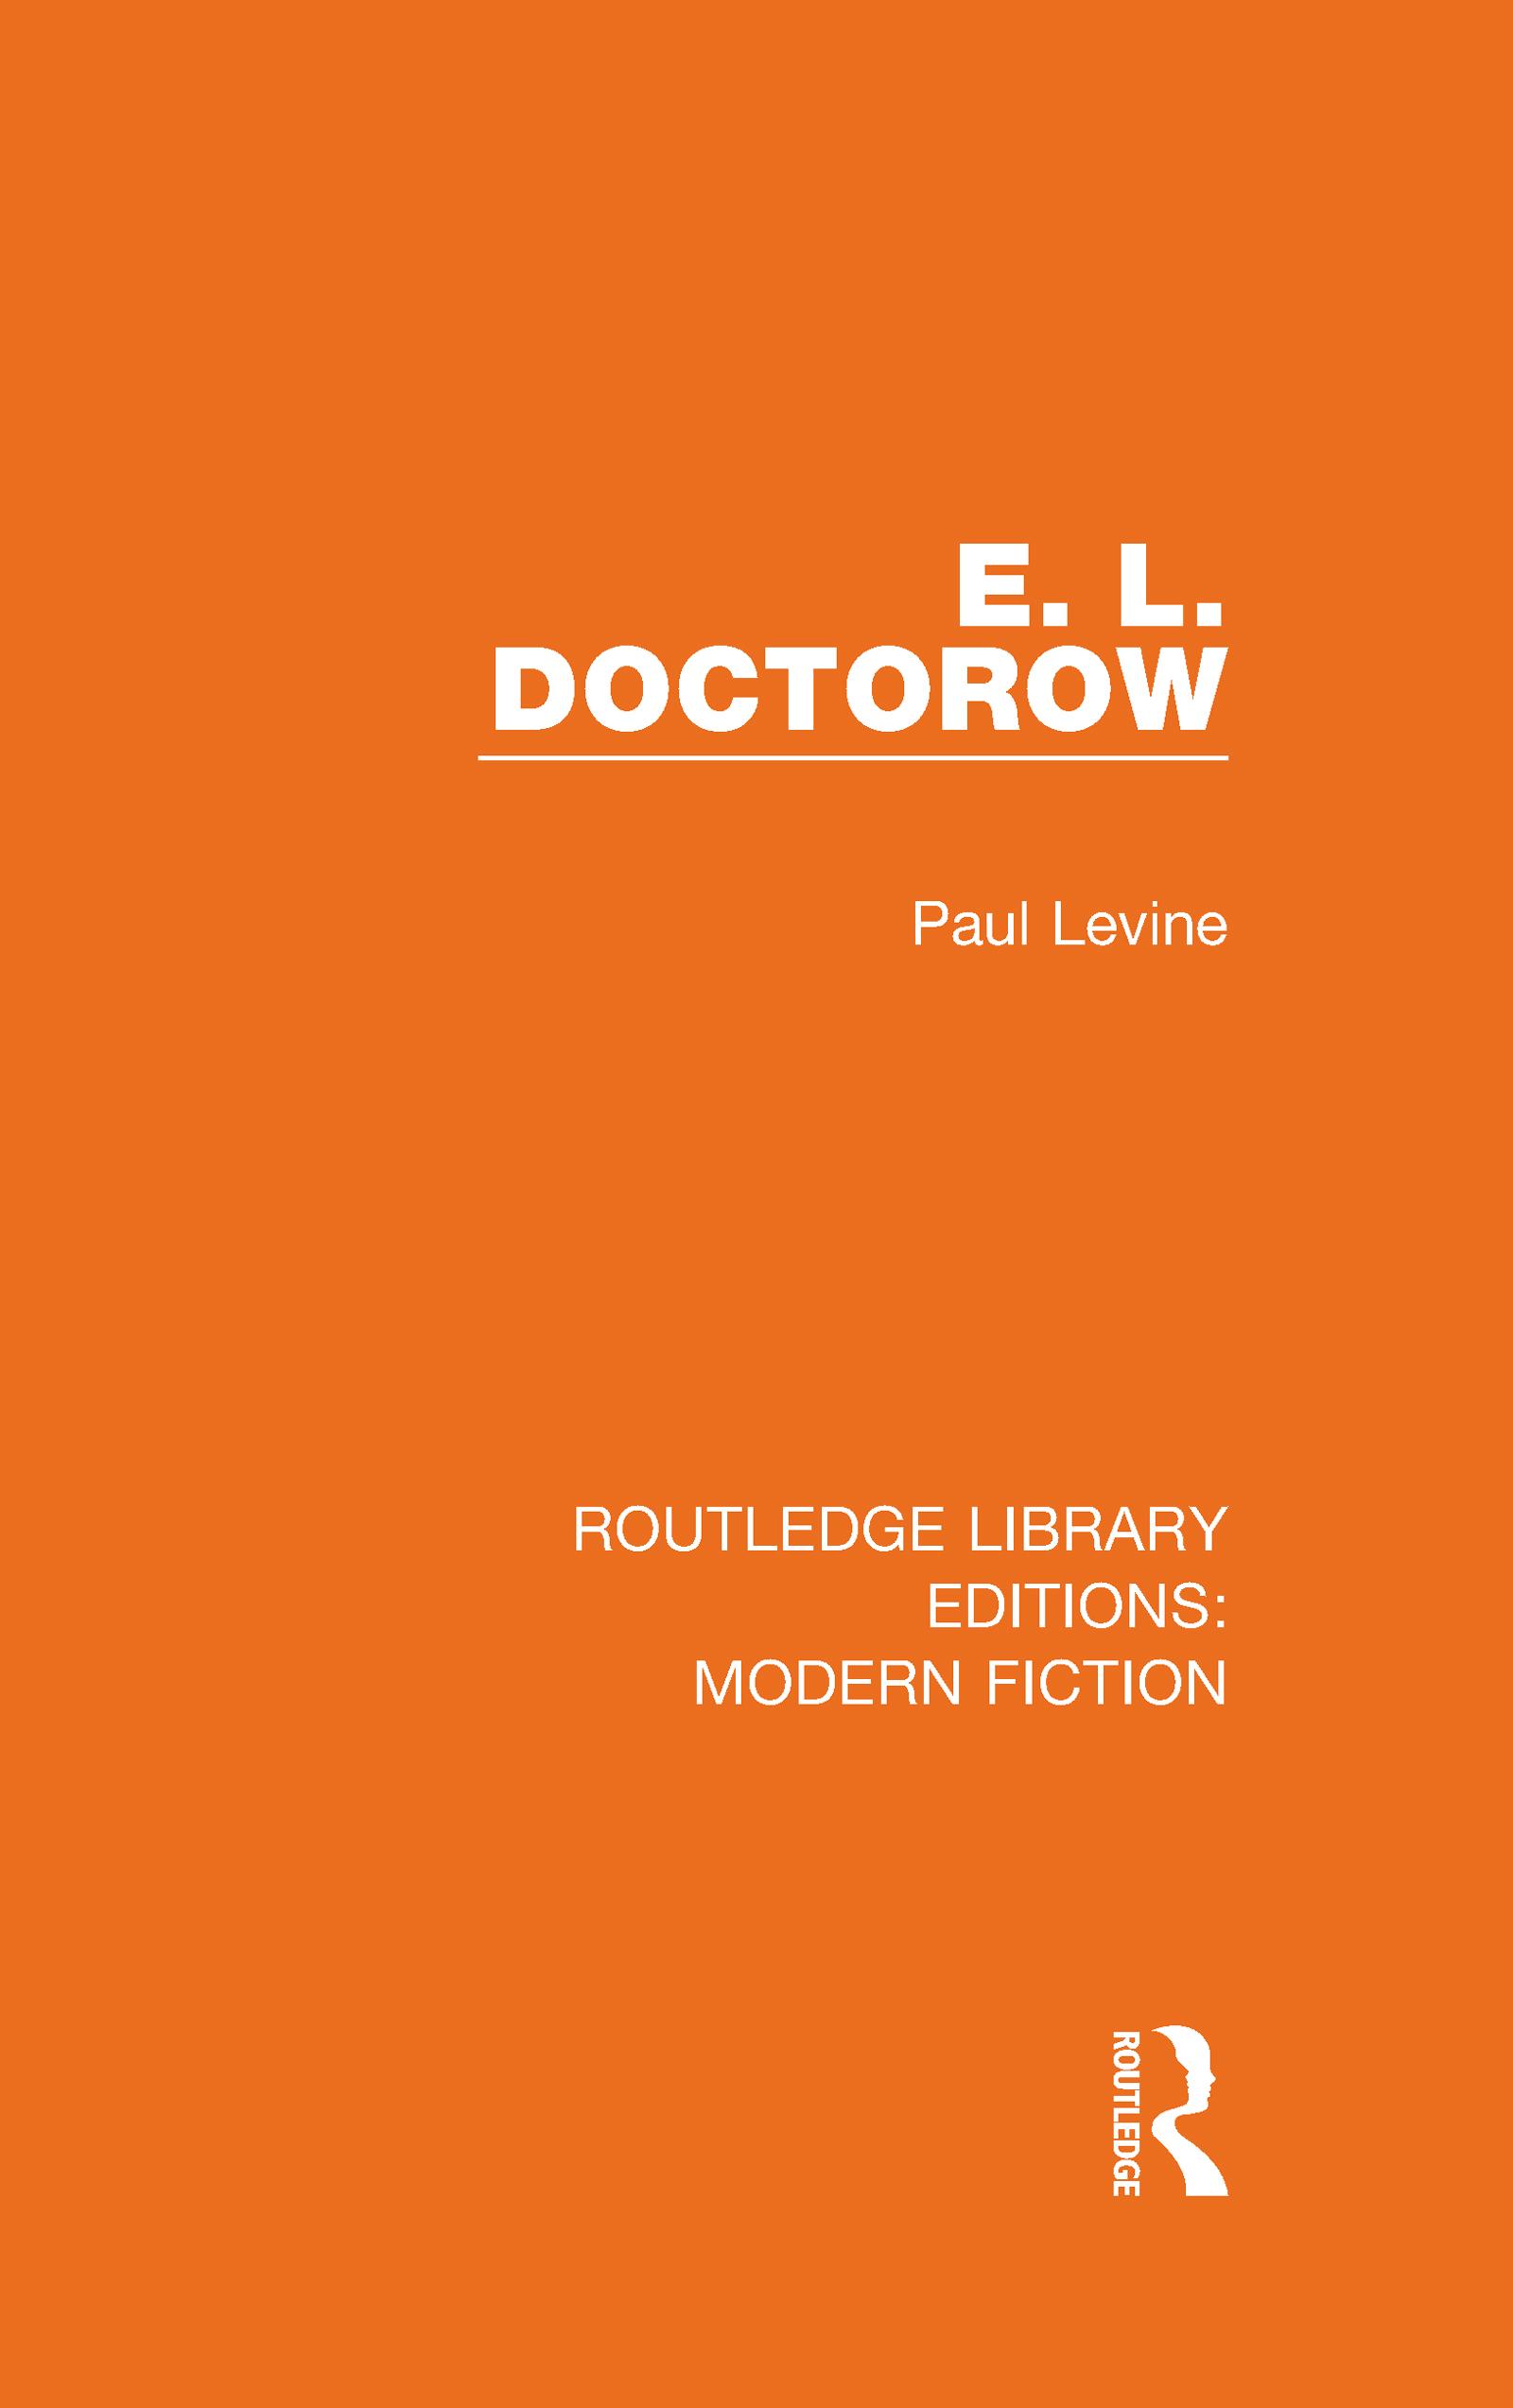 E. L. Doctorow